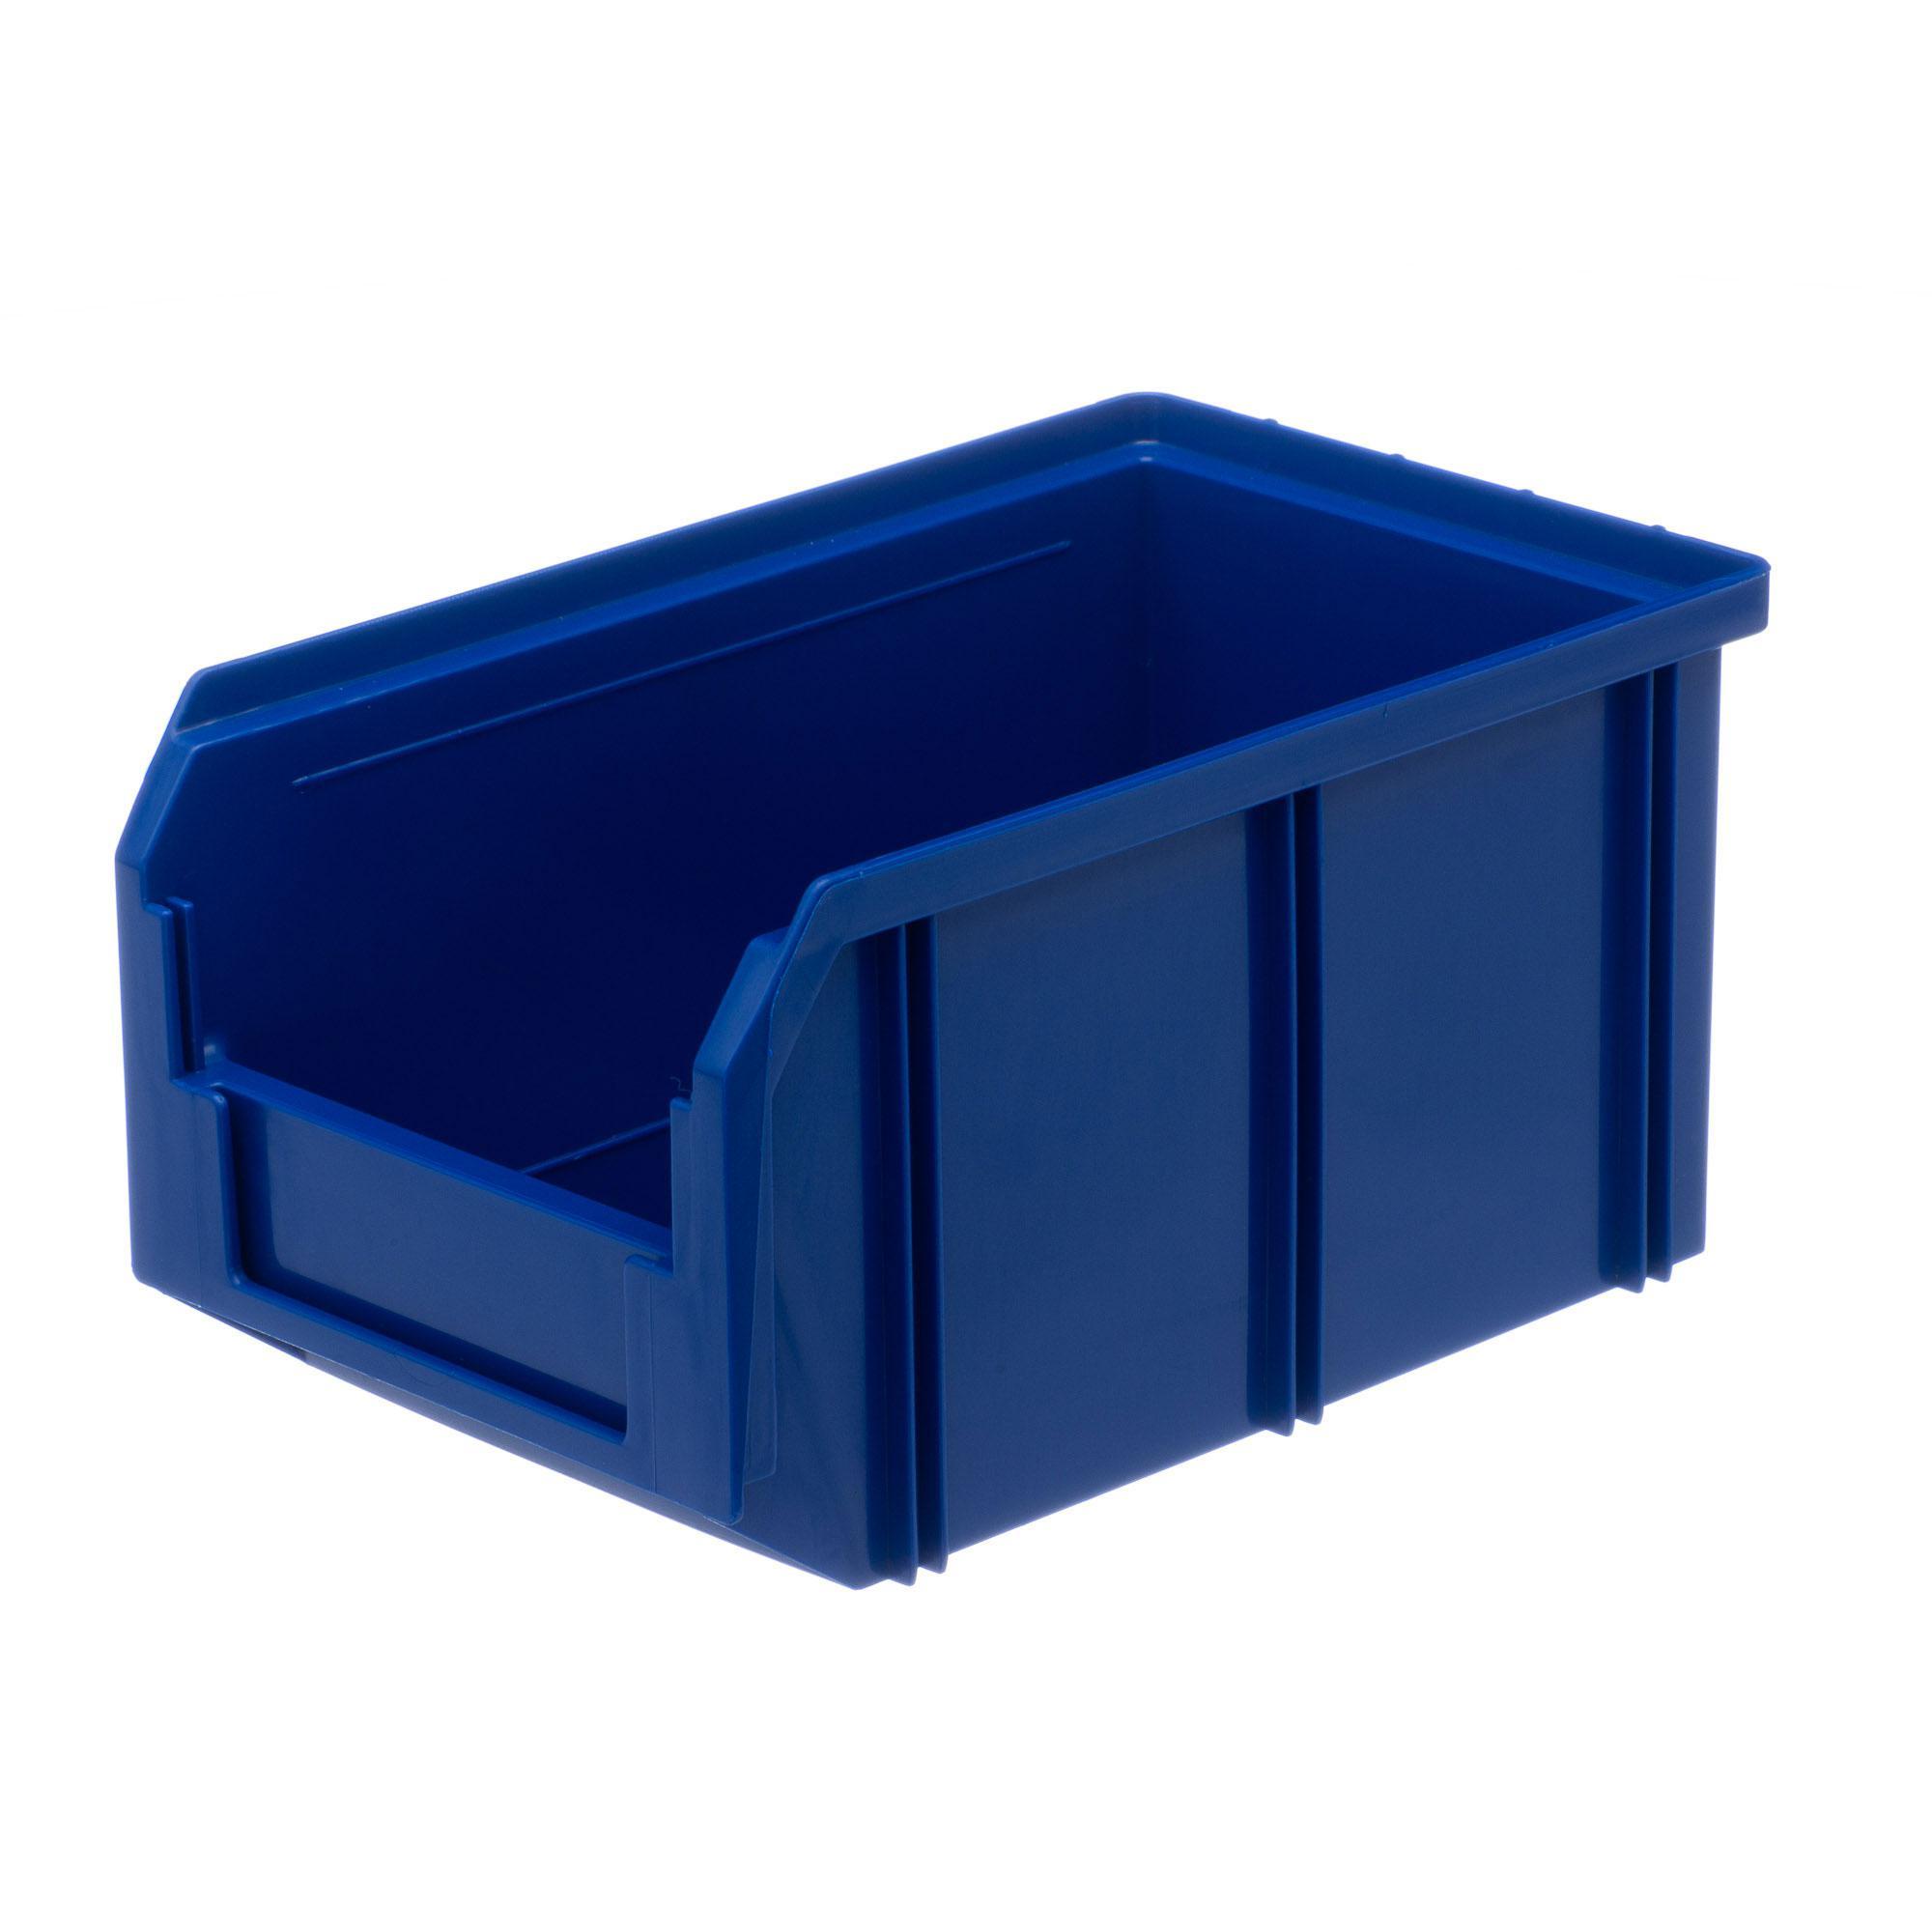 Ящик СТЕЛЛА V-2 синий от 220 Вольт